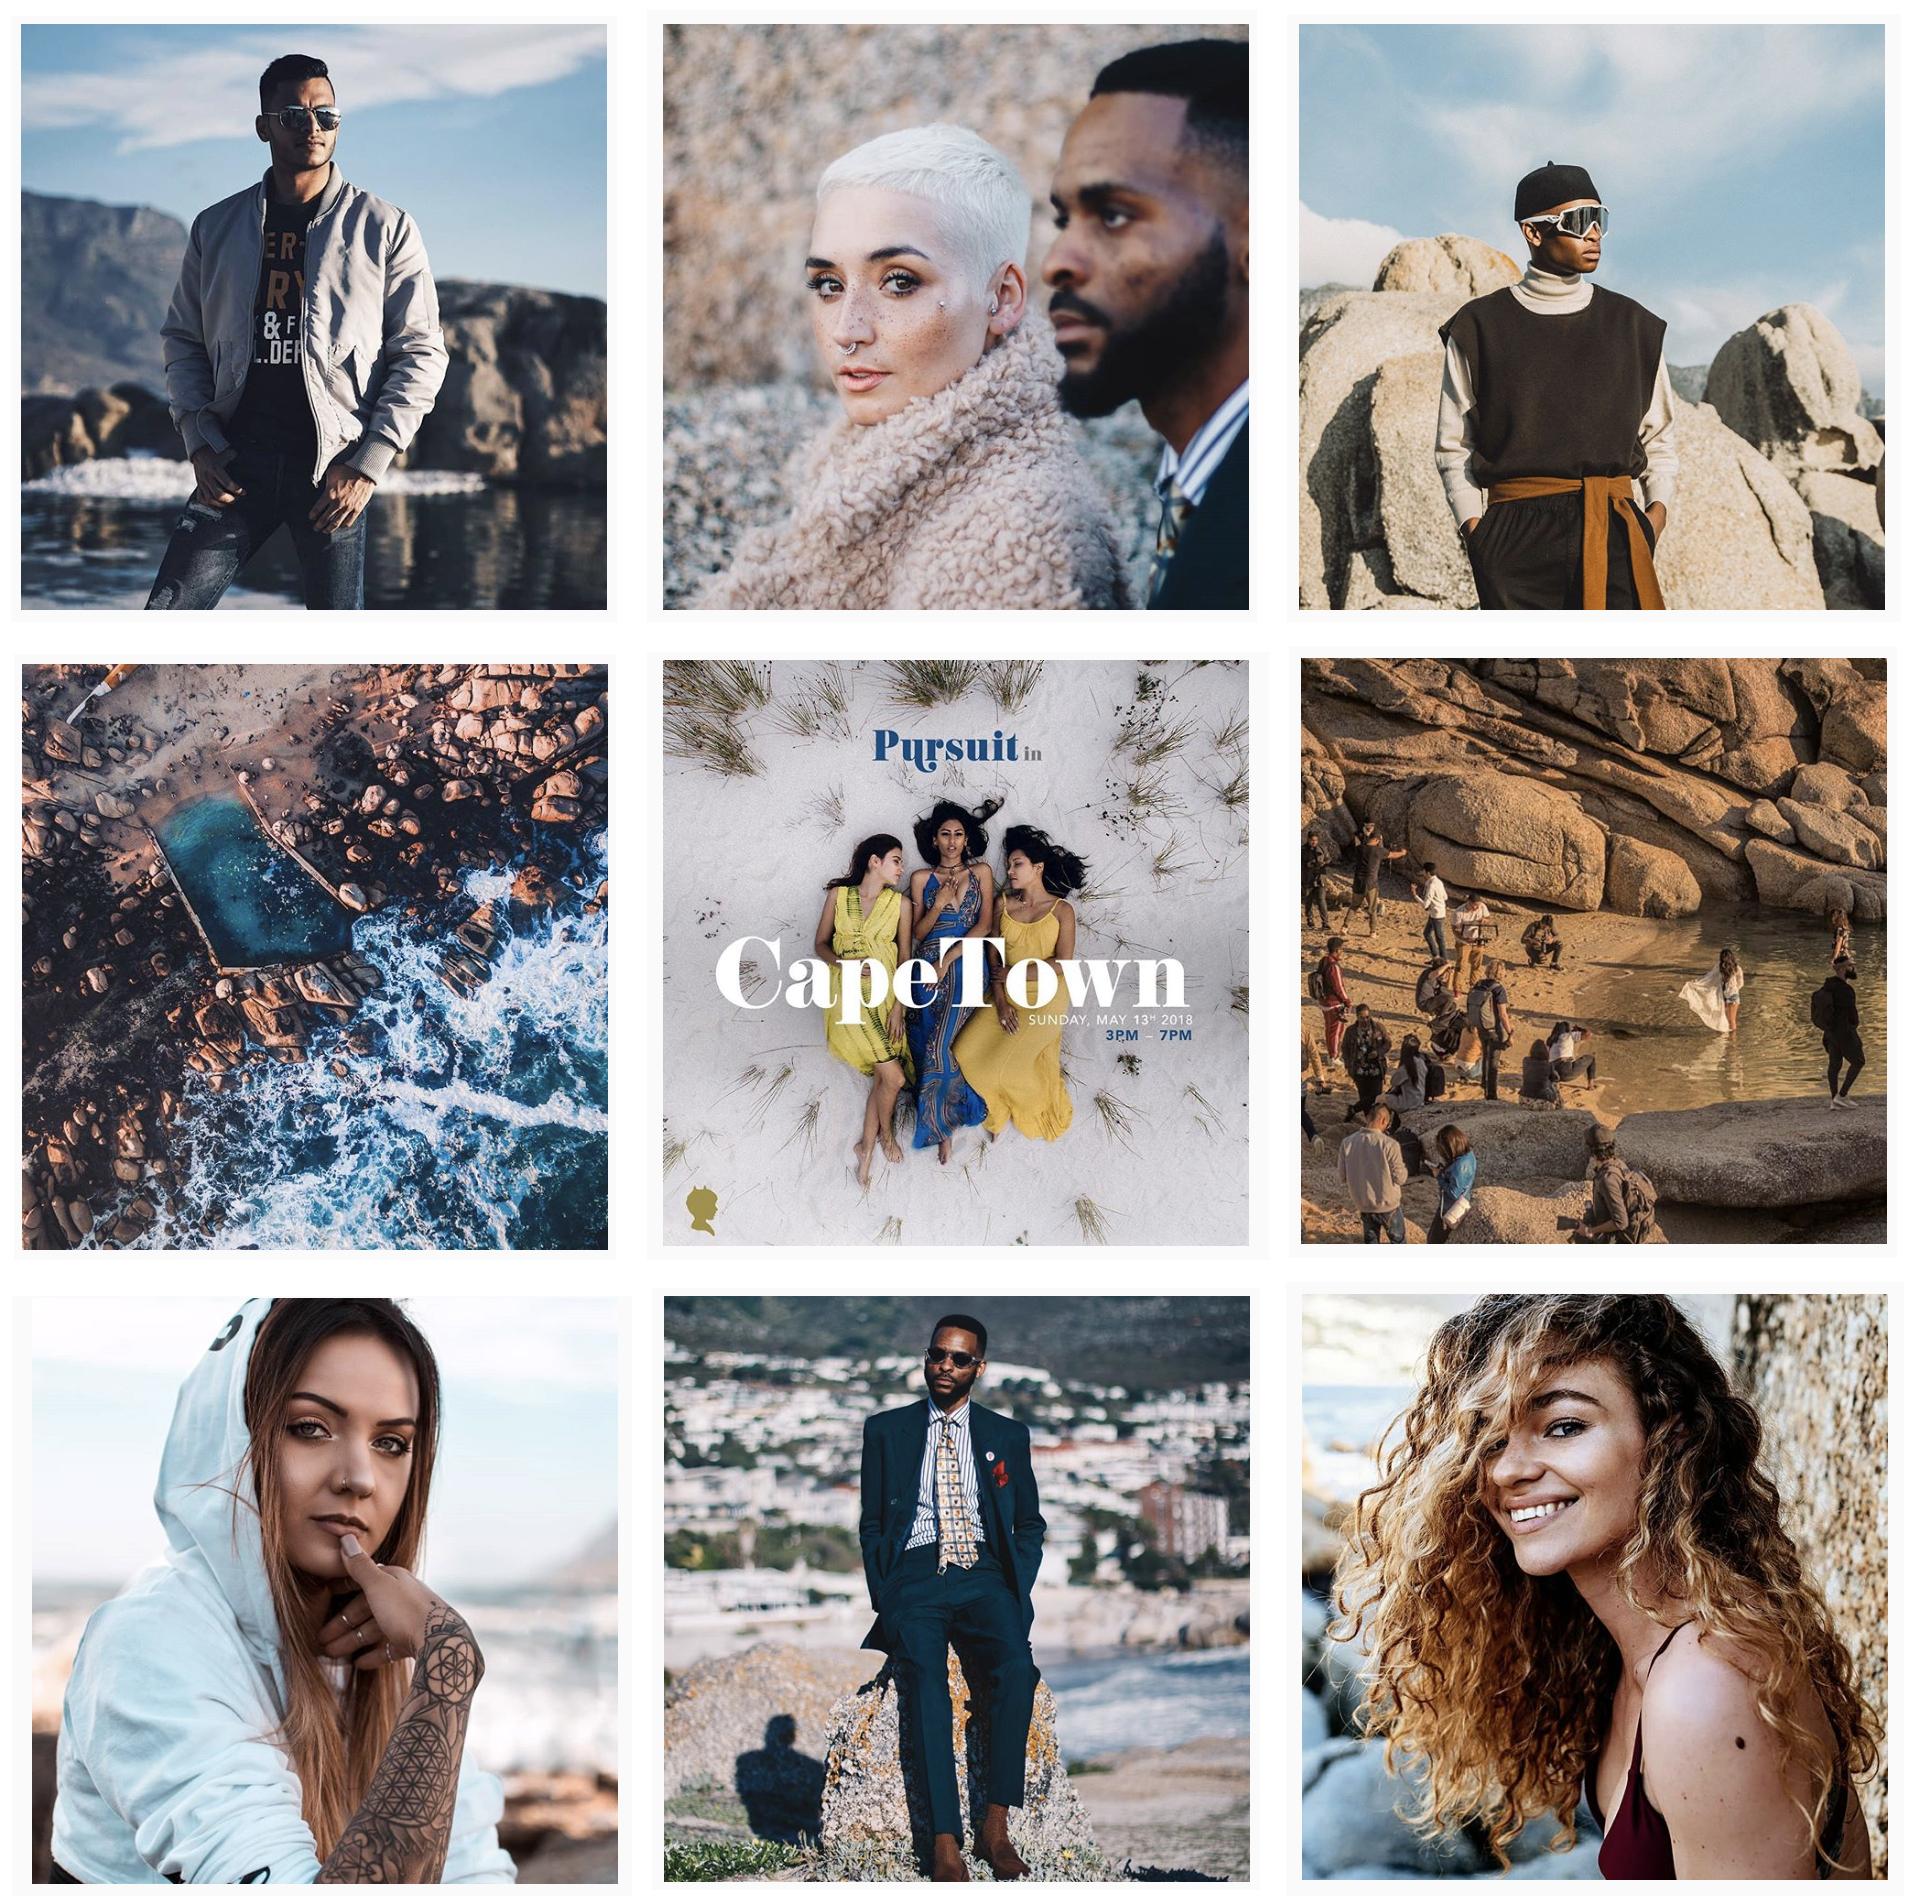 Select photos above via #PoPxCapeTown